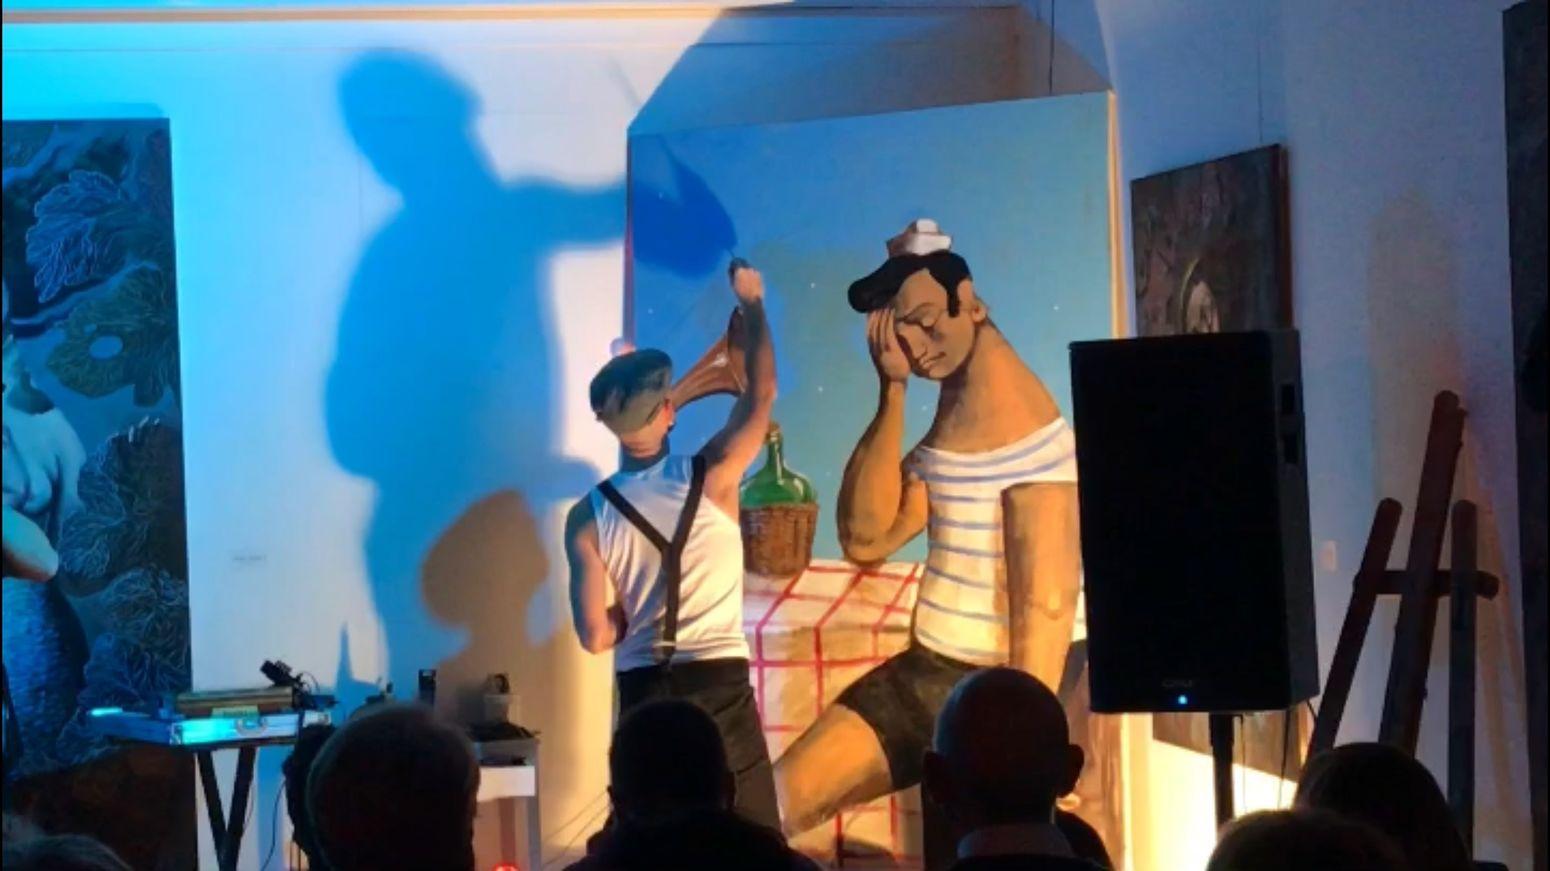 Art Lovers Arte Israel Nicolás 🎨 Hijos De Un Dios Pagano Art Expo Creativity Human Representation Art And Craft Male Likeness Real People Standing Men